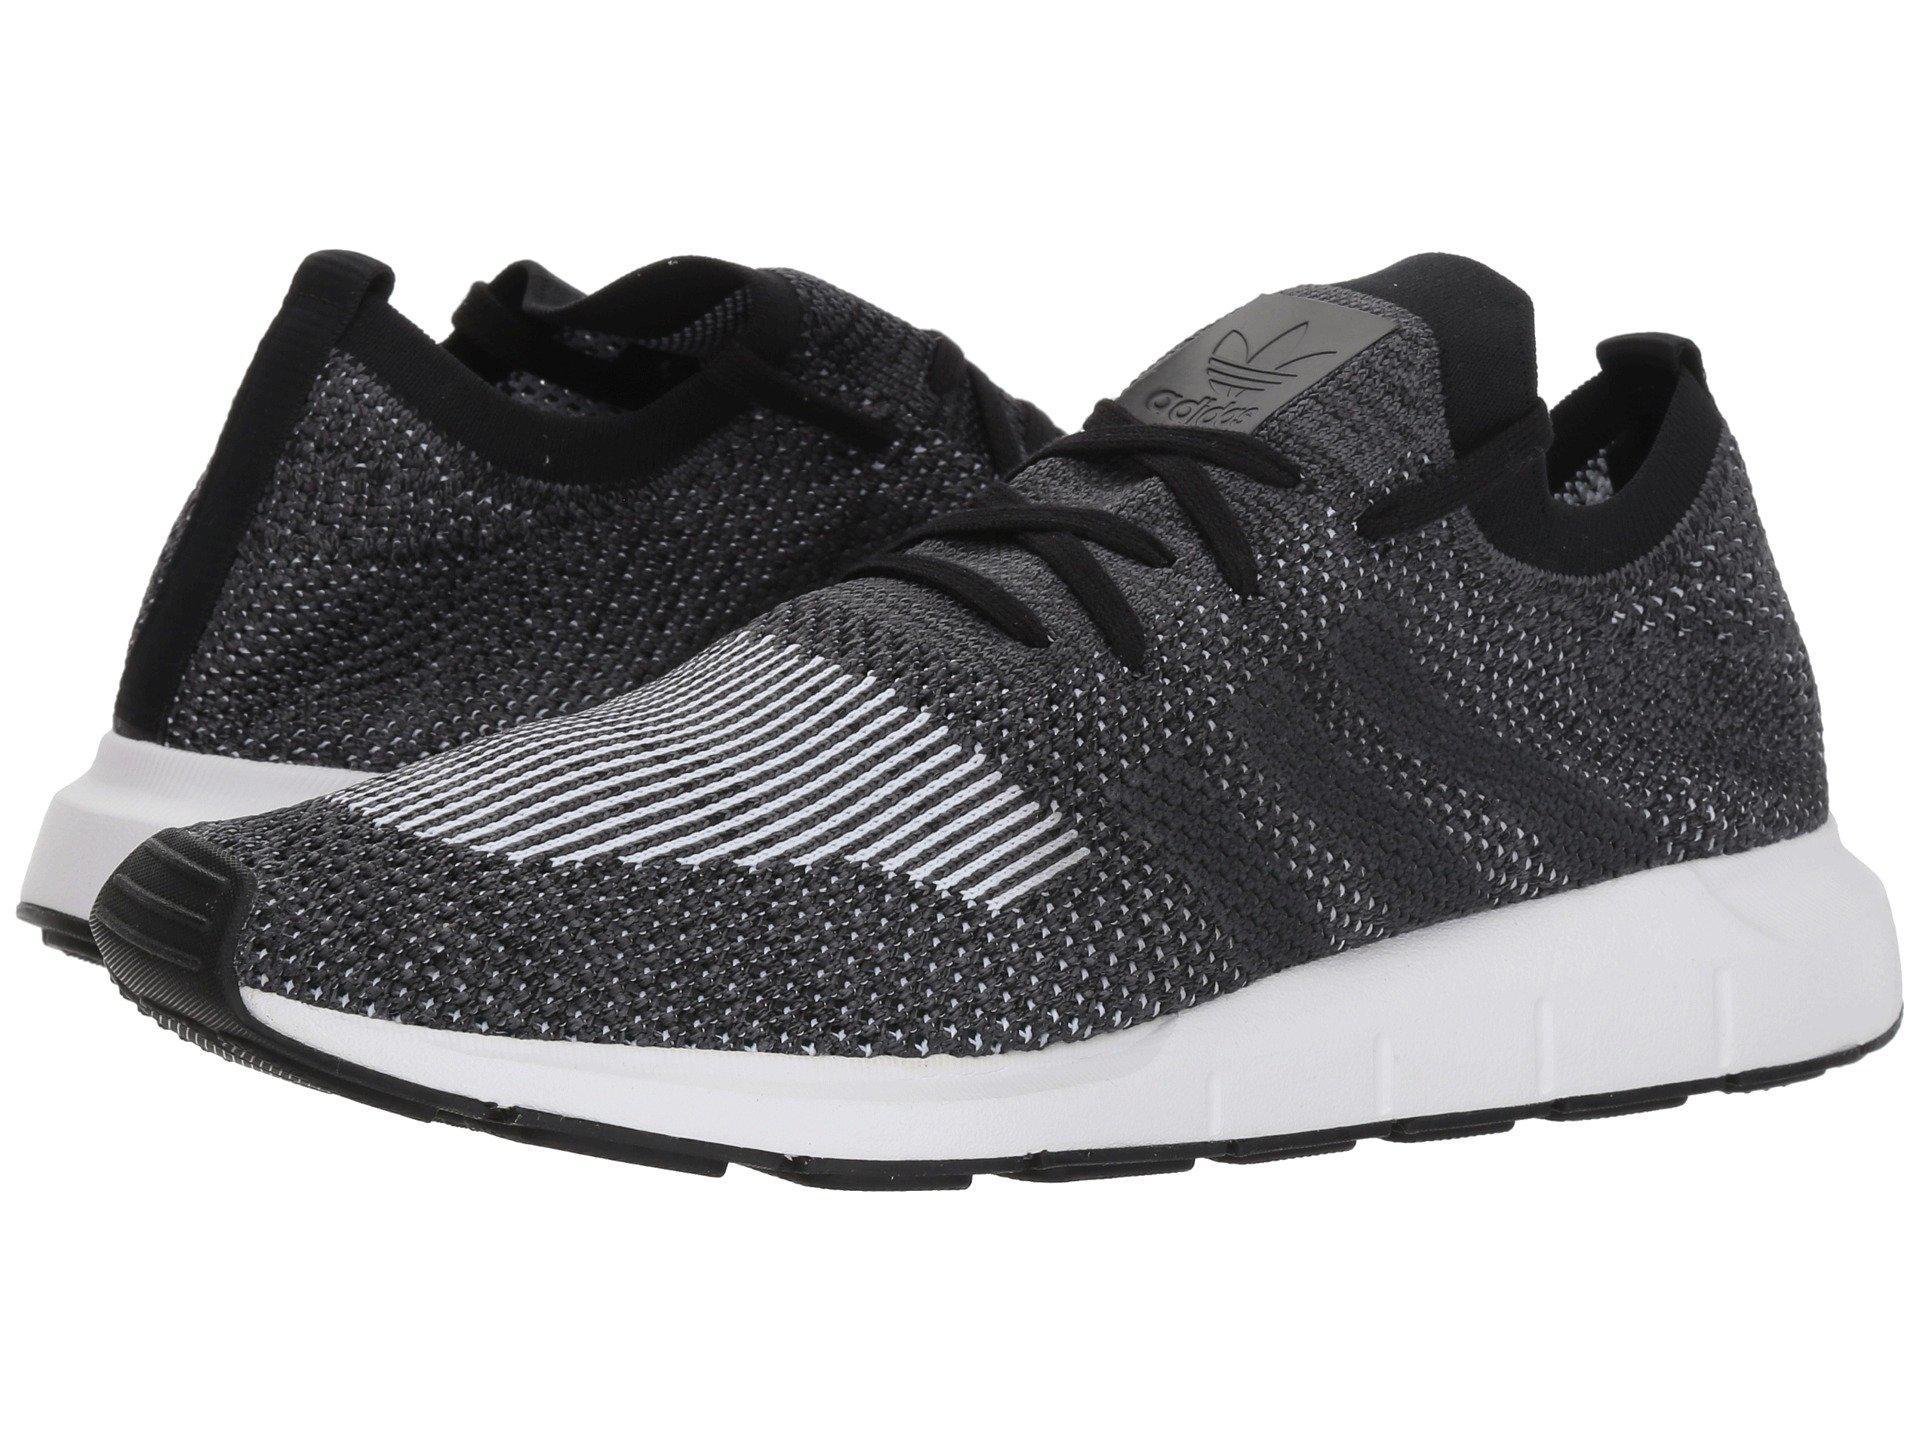 d98fd28c379 Lyst - Adidas Swift Run Pk (cblack grefiv cblack) Men s Shoes in ...